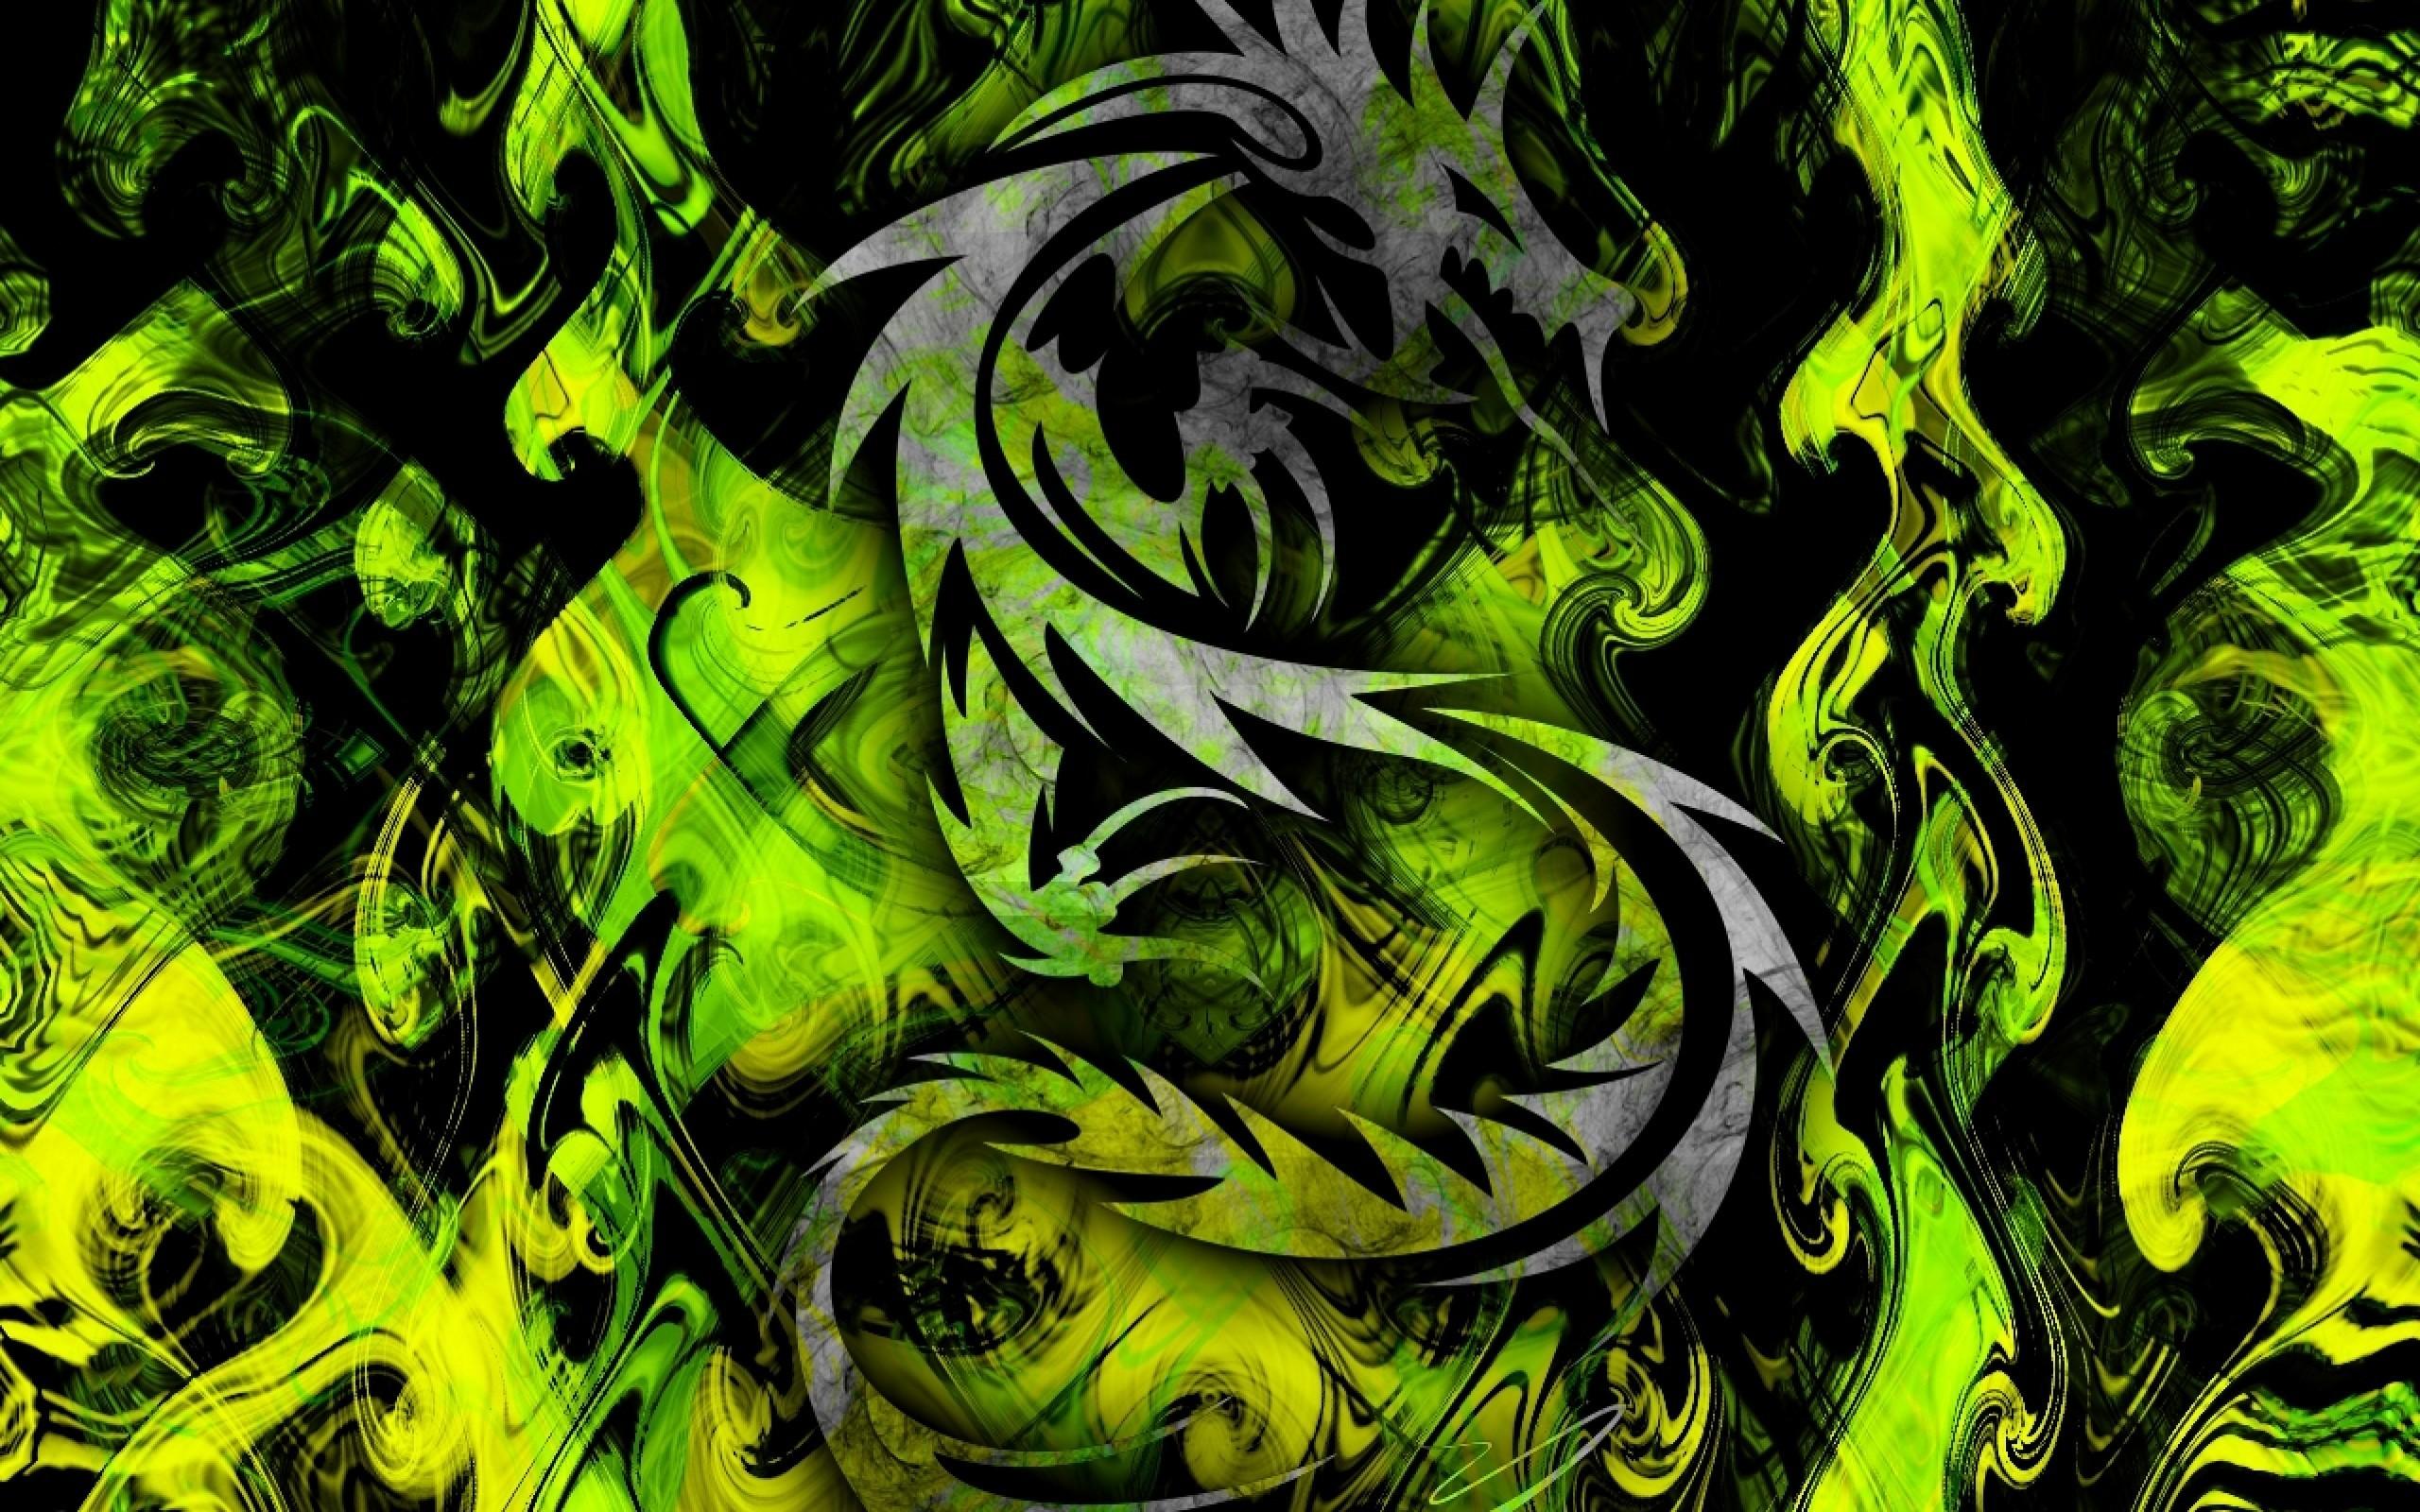 1920x1080 Green Dragon Wallpapers